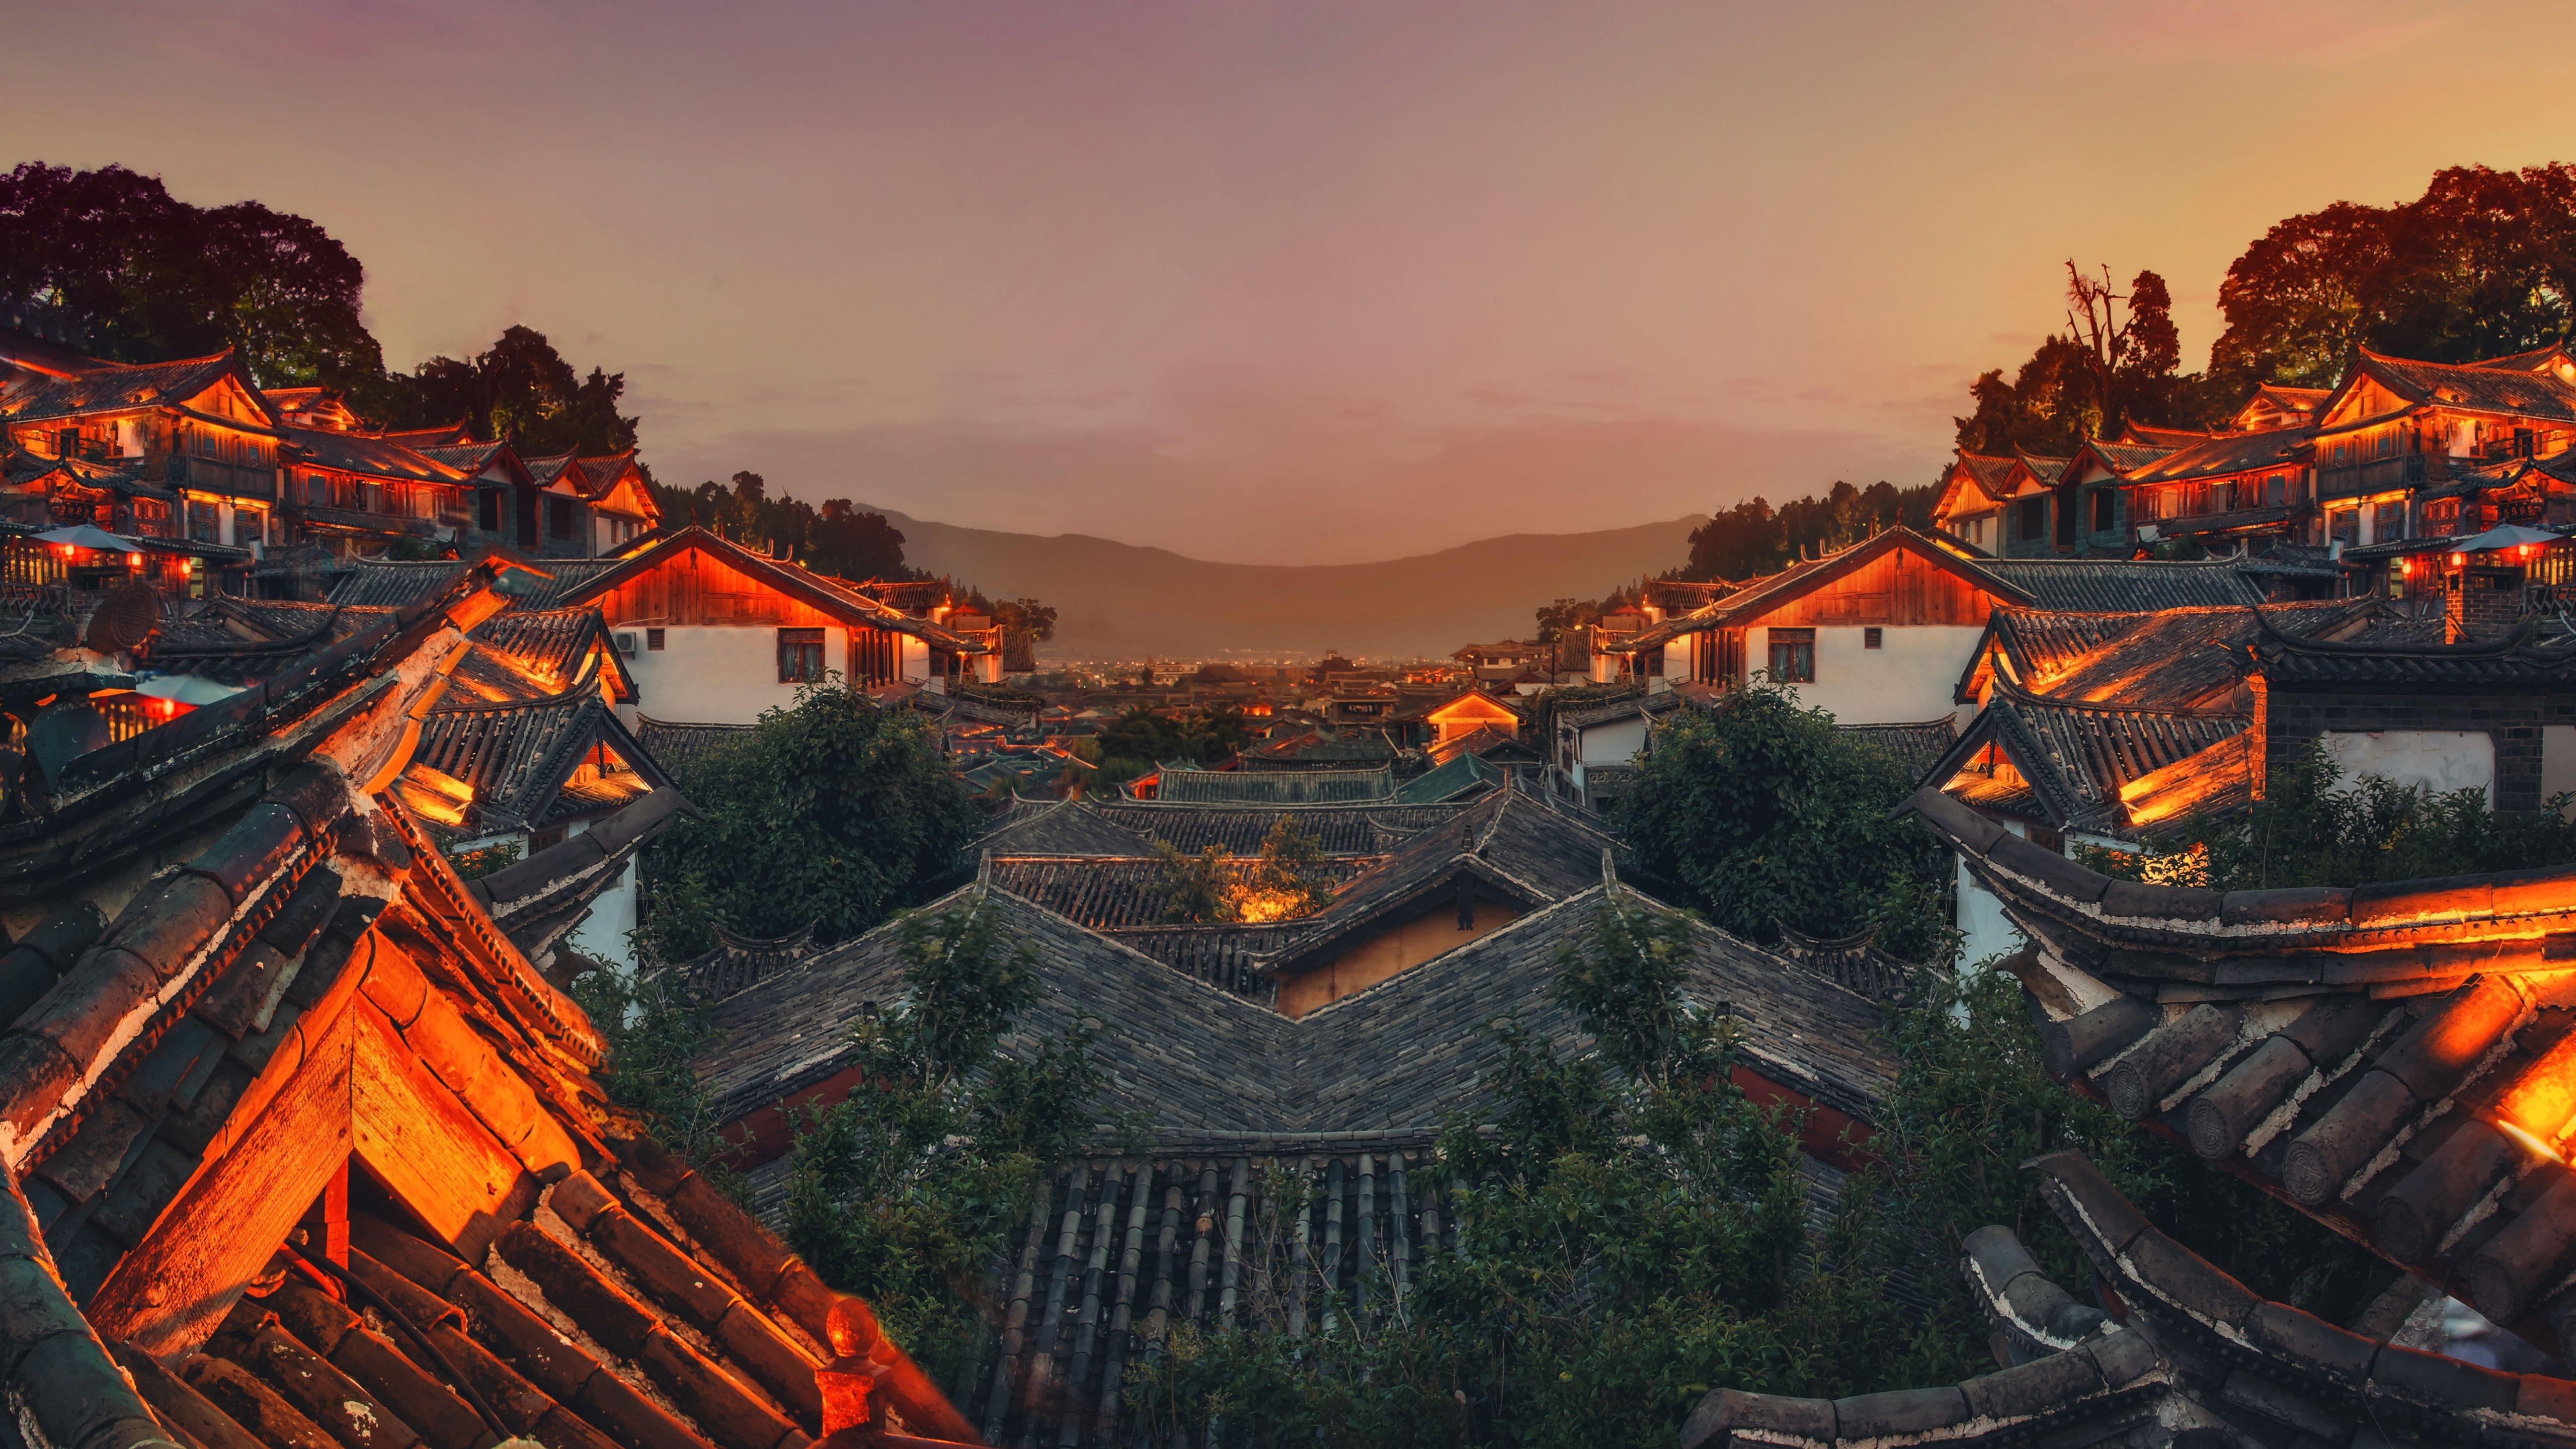 Paisaje De China Al Atardecer Fondo De Pantalla 5k Ultra Hd